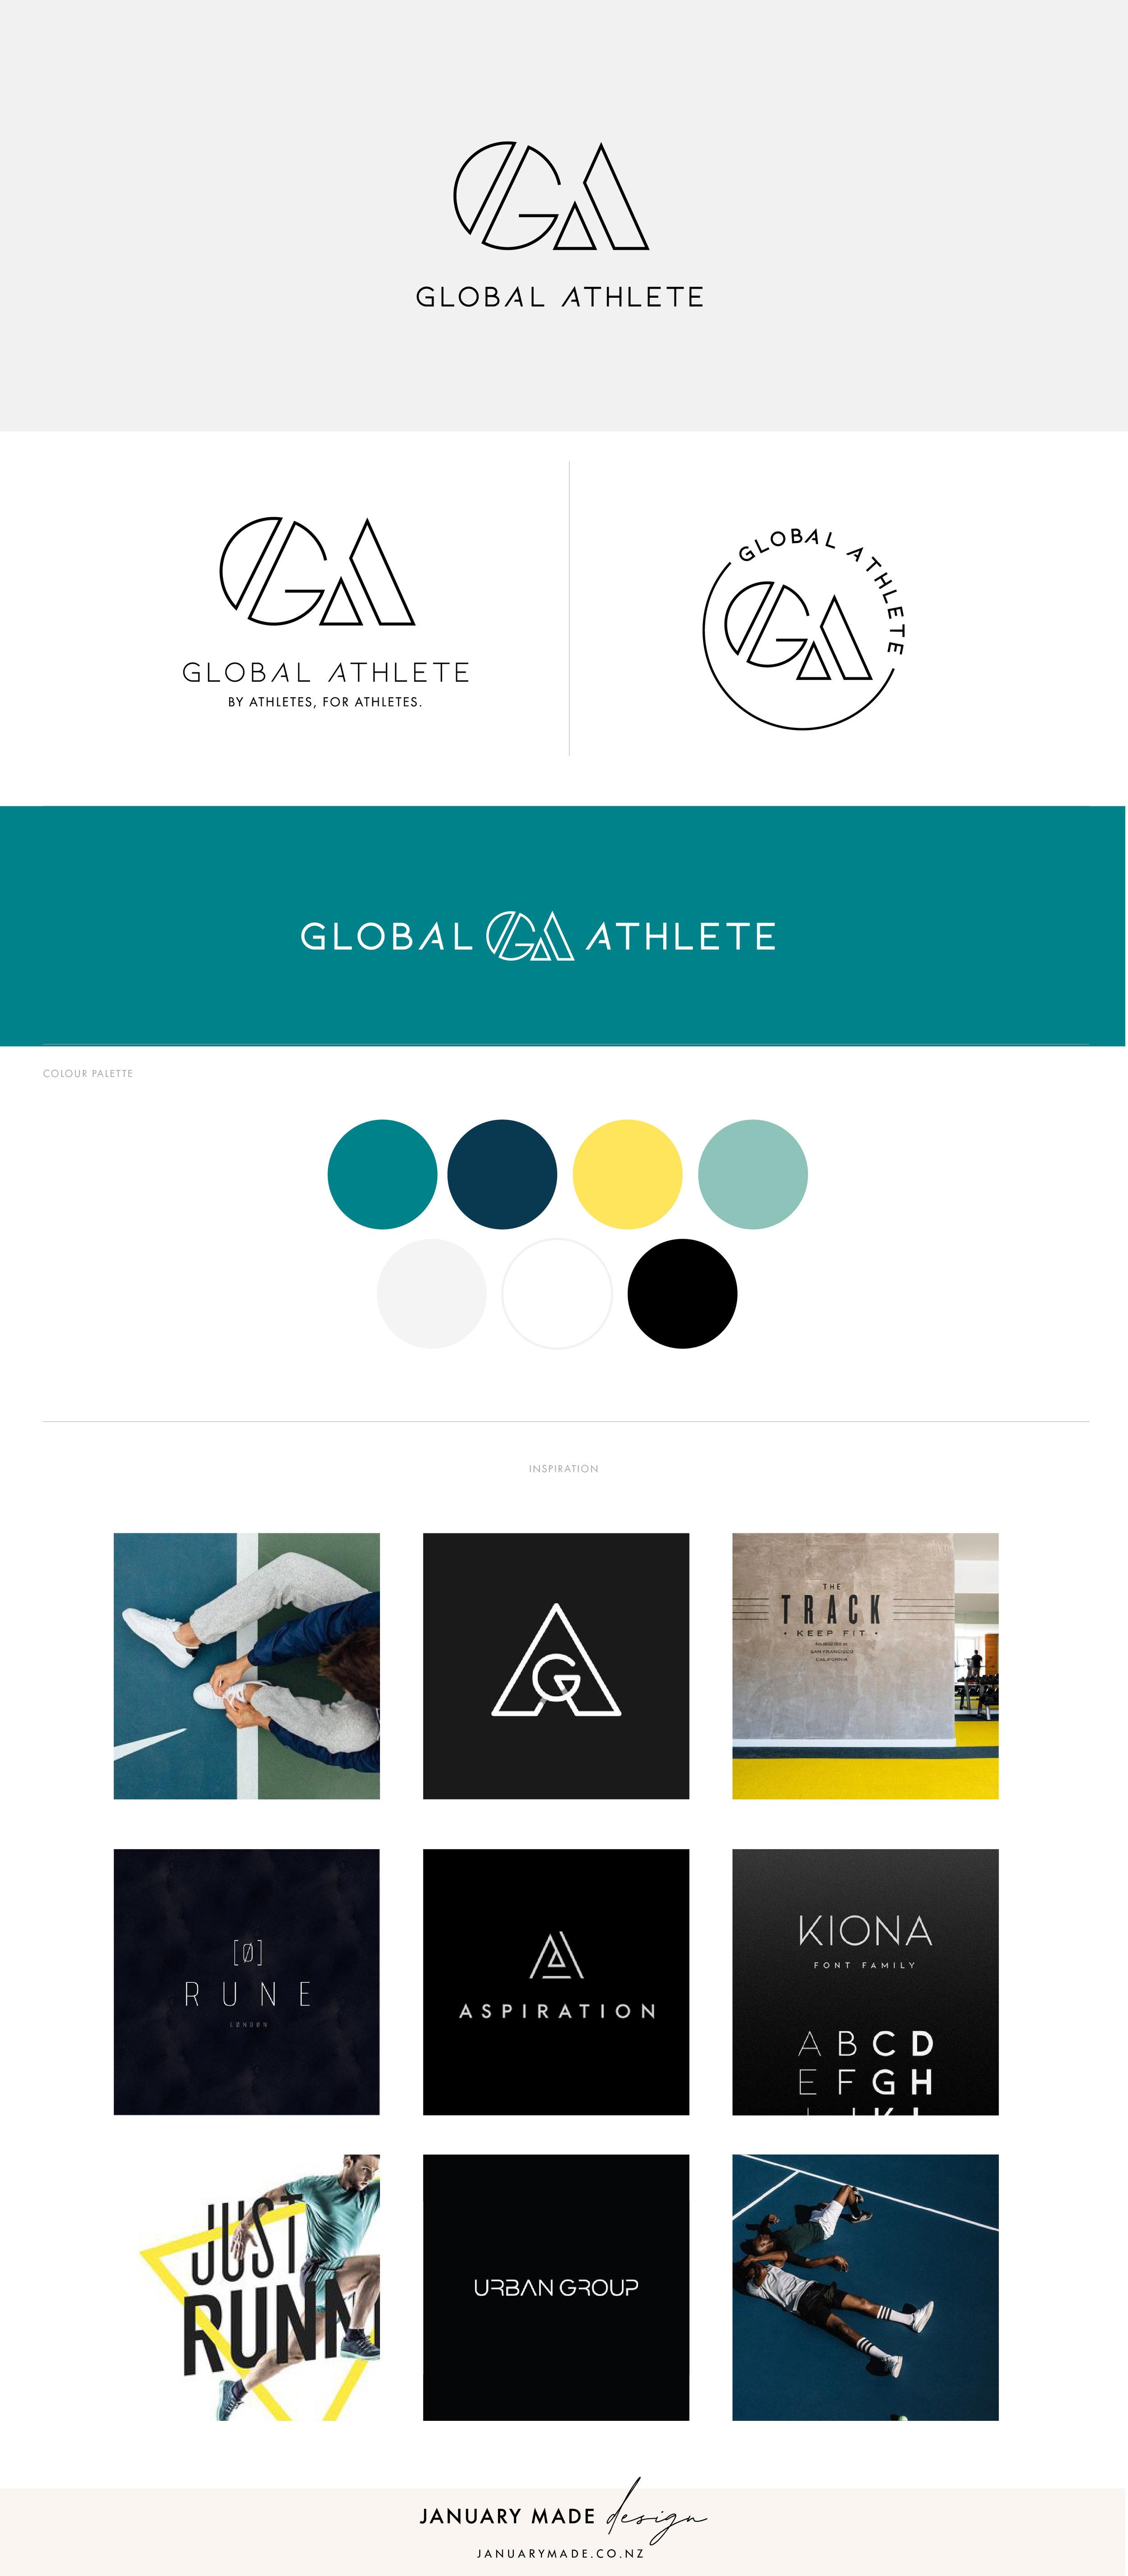 Global Athlete Brandboard showcase - by January Made Design